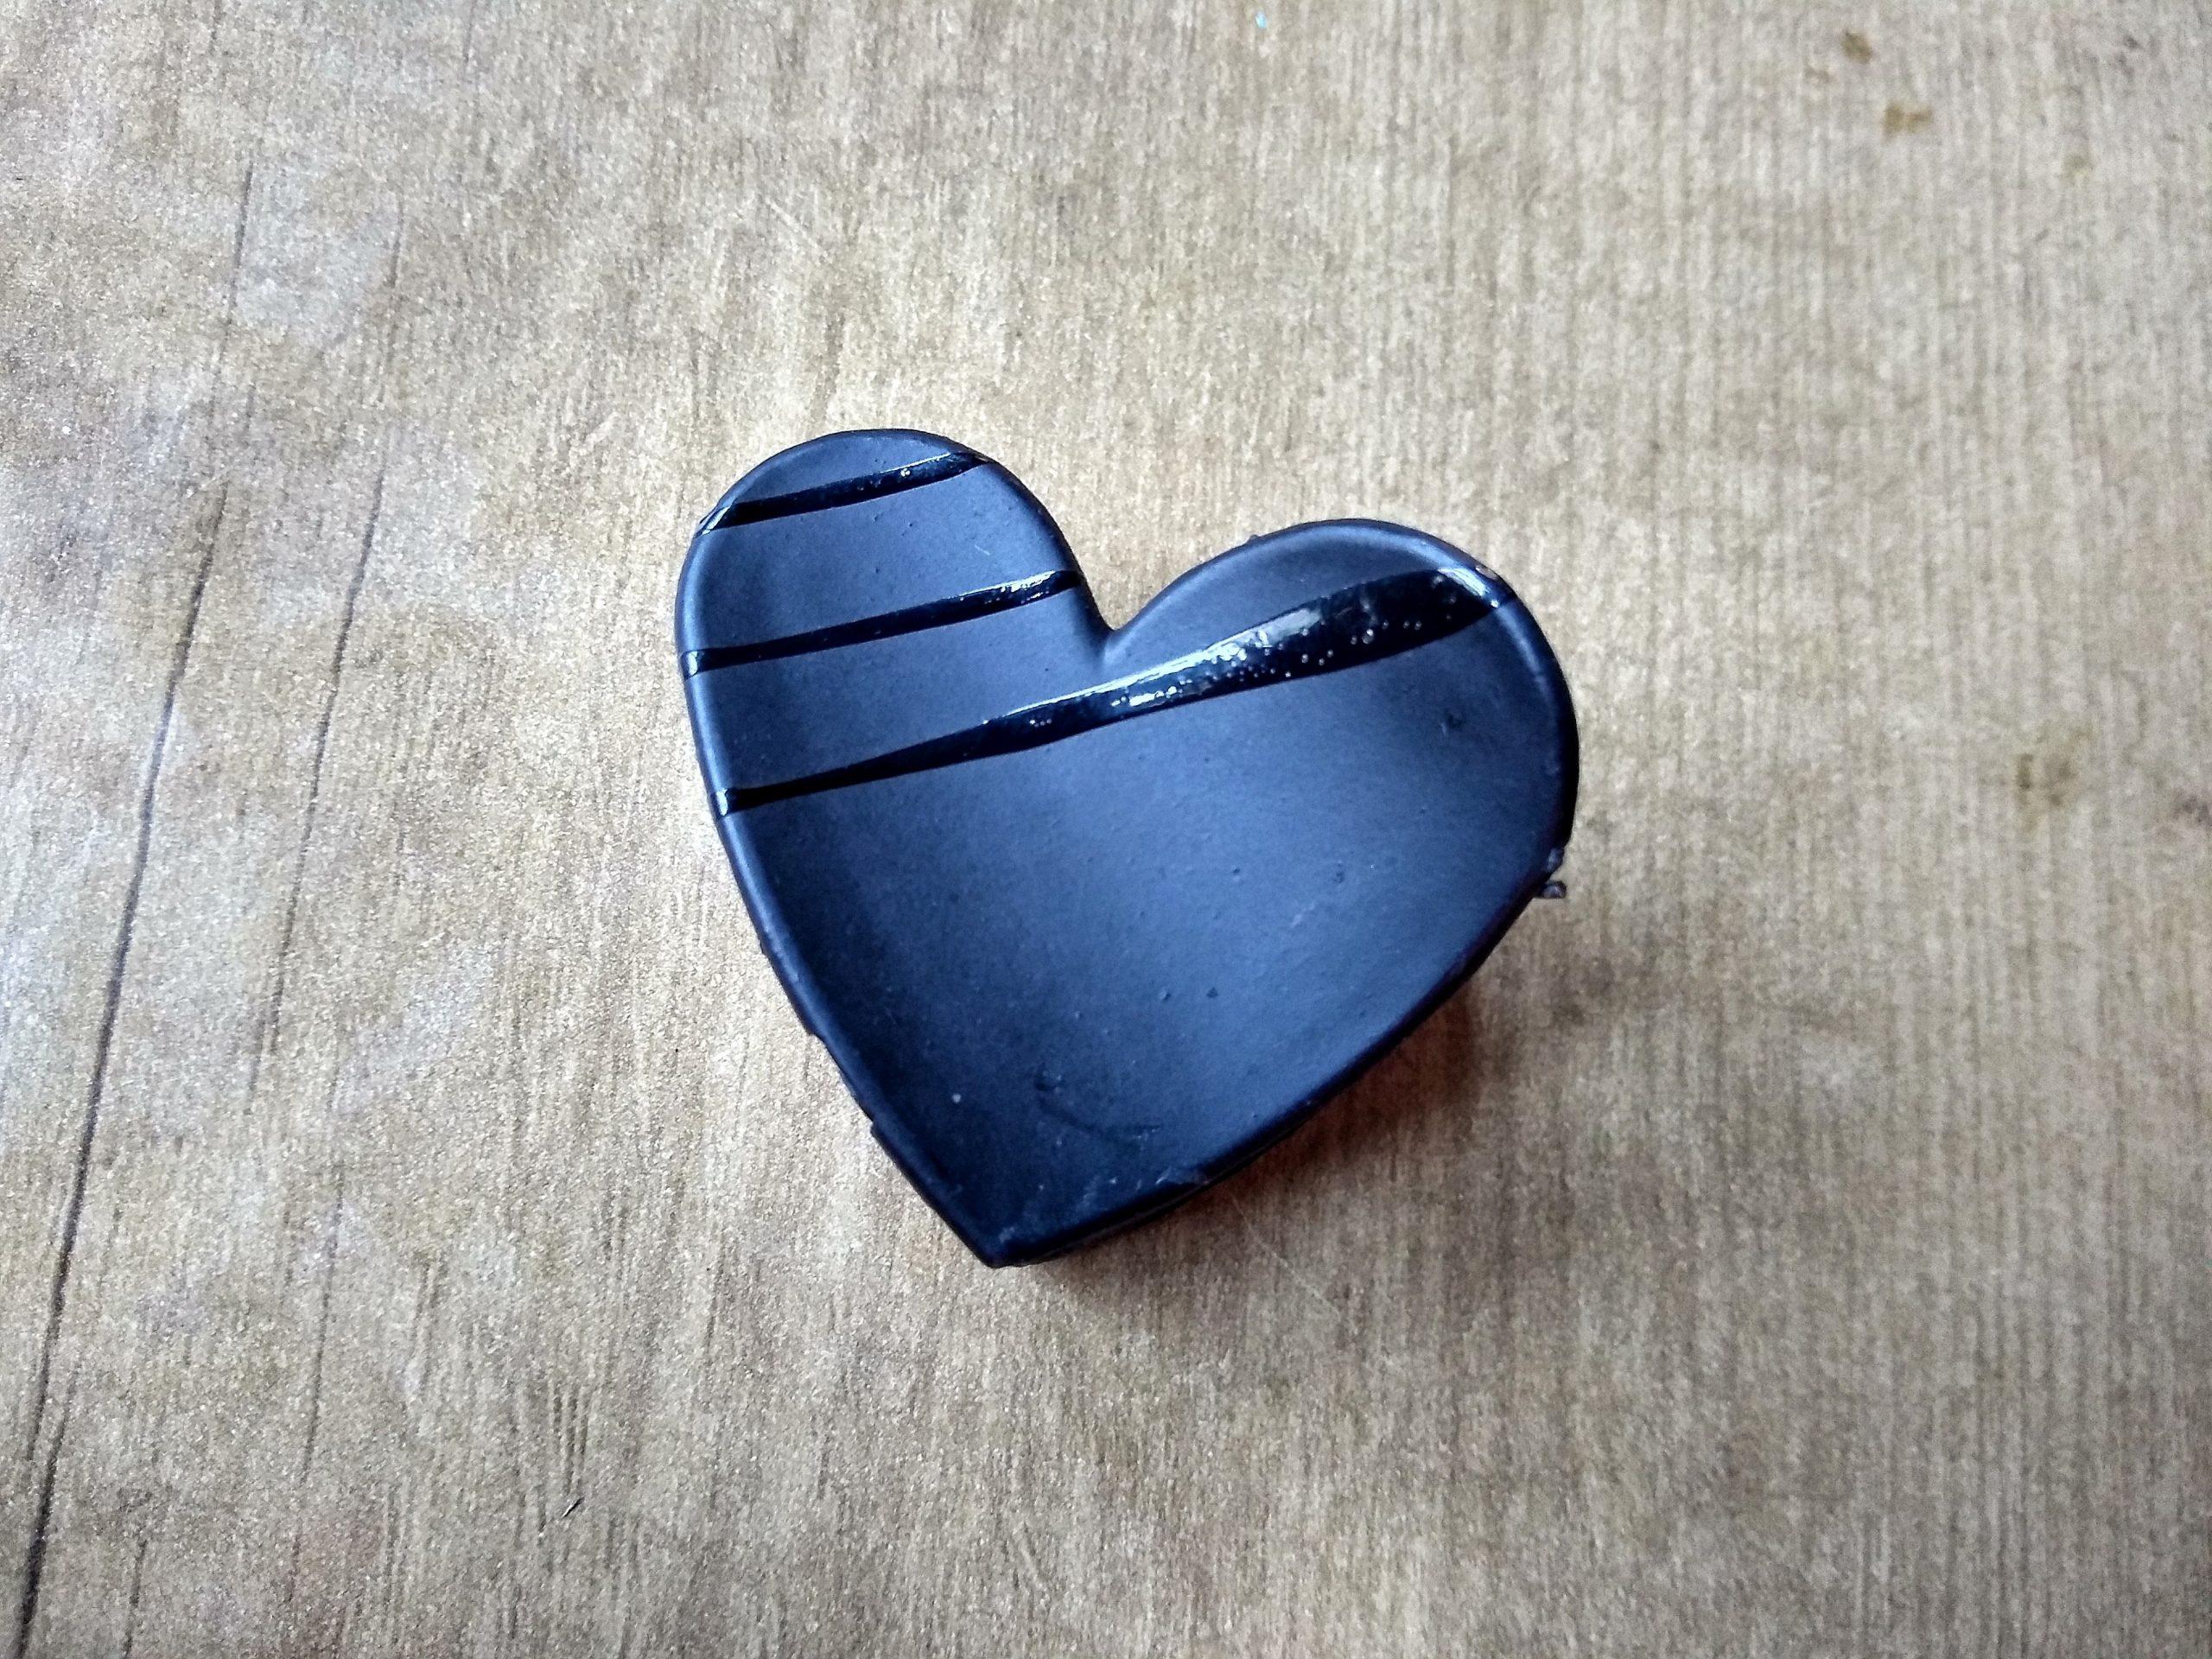 A heart shape clip